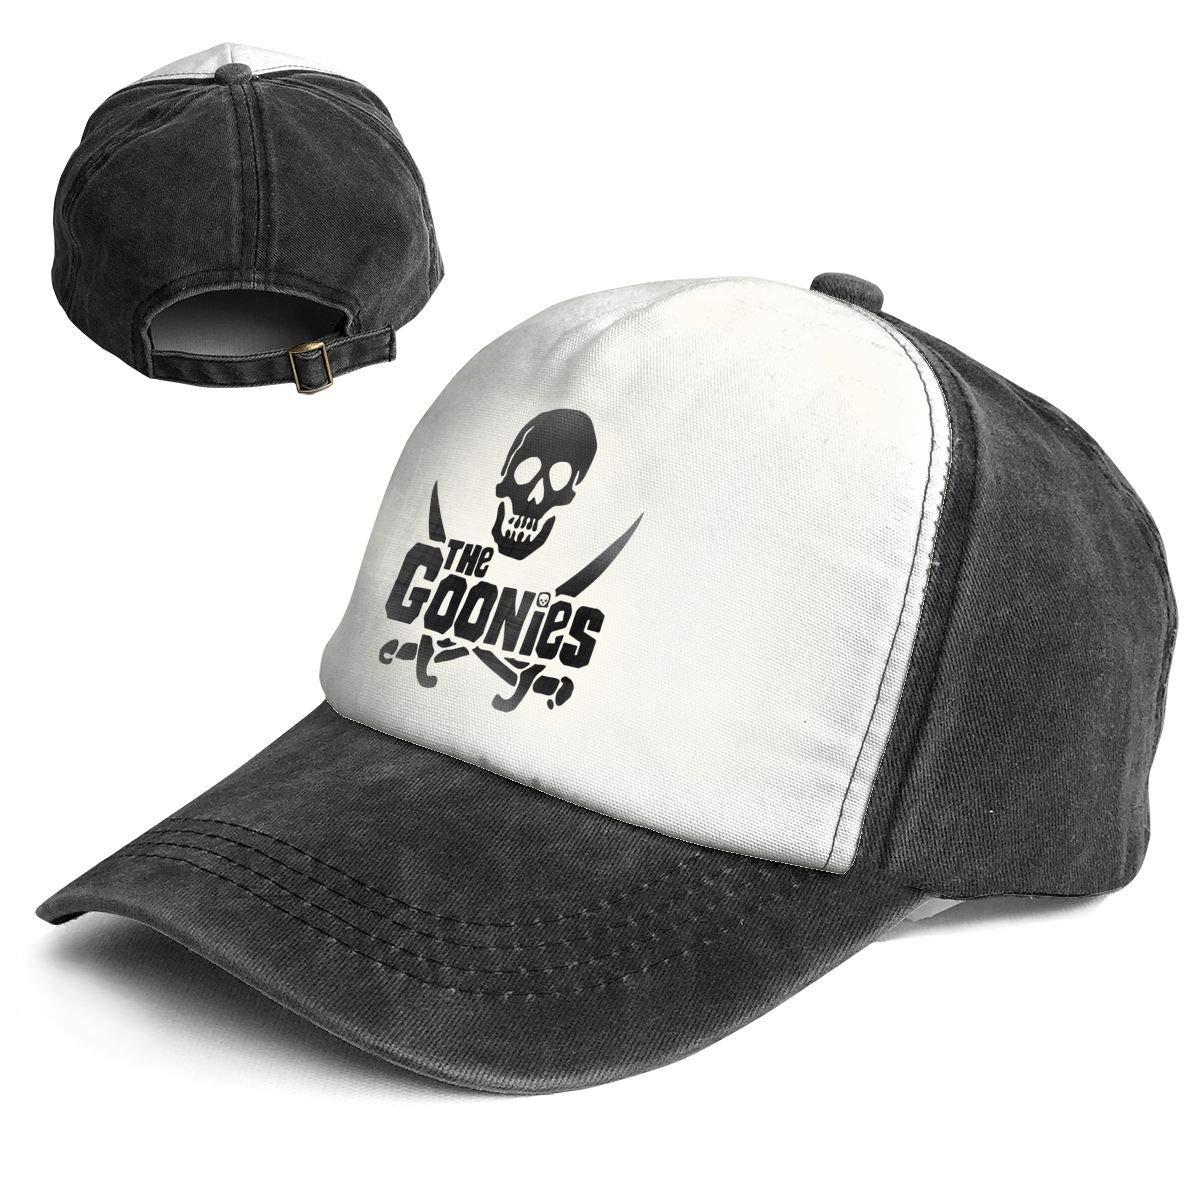 QZDLq Fashion Vintage Hat The Goonies Skull Adjustable Dad Hat Baseball Cowboy Cap